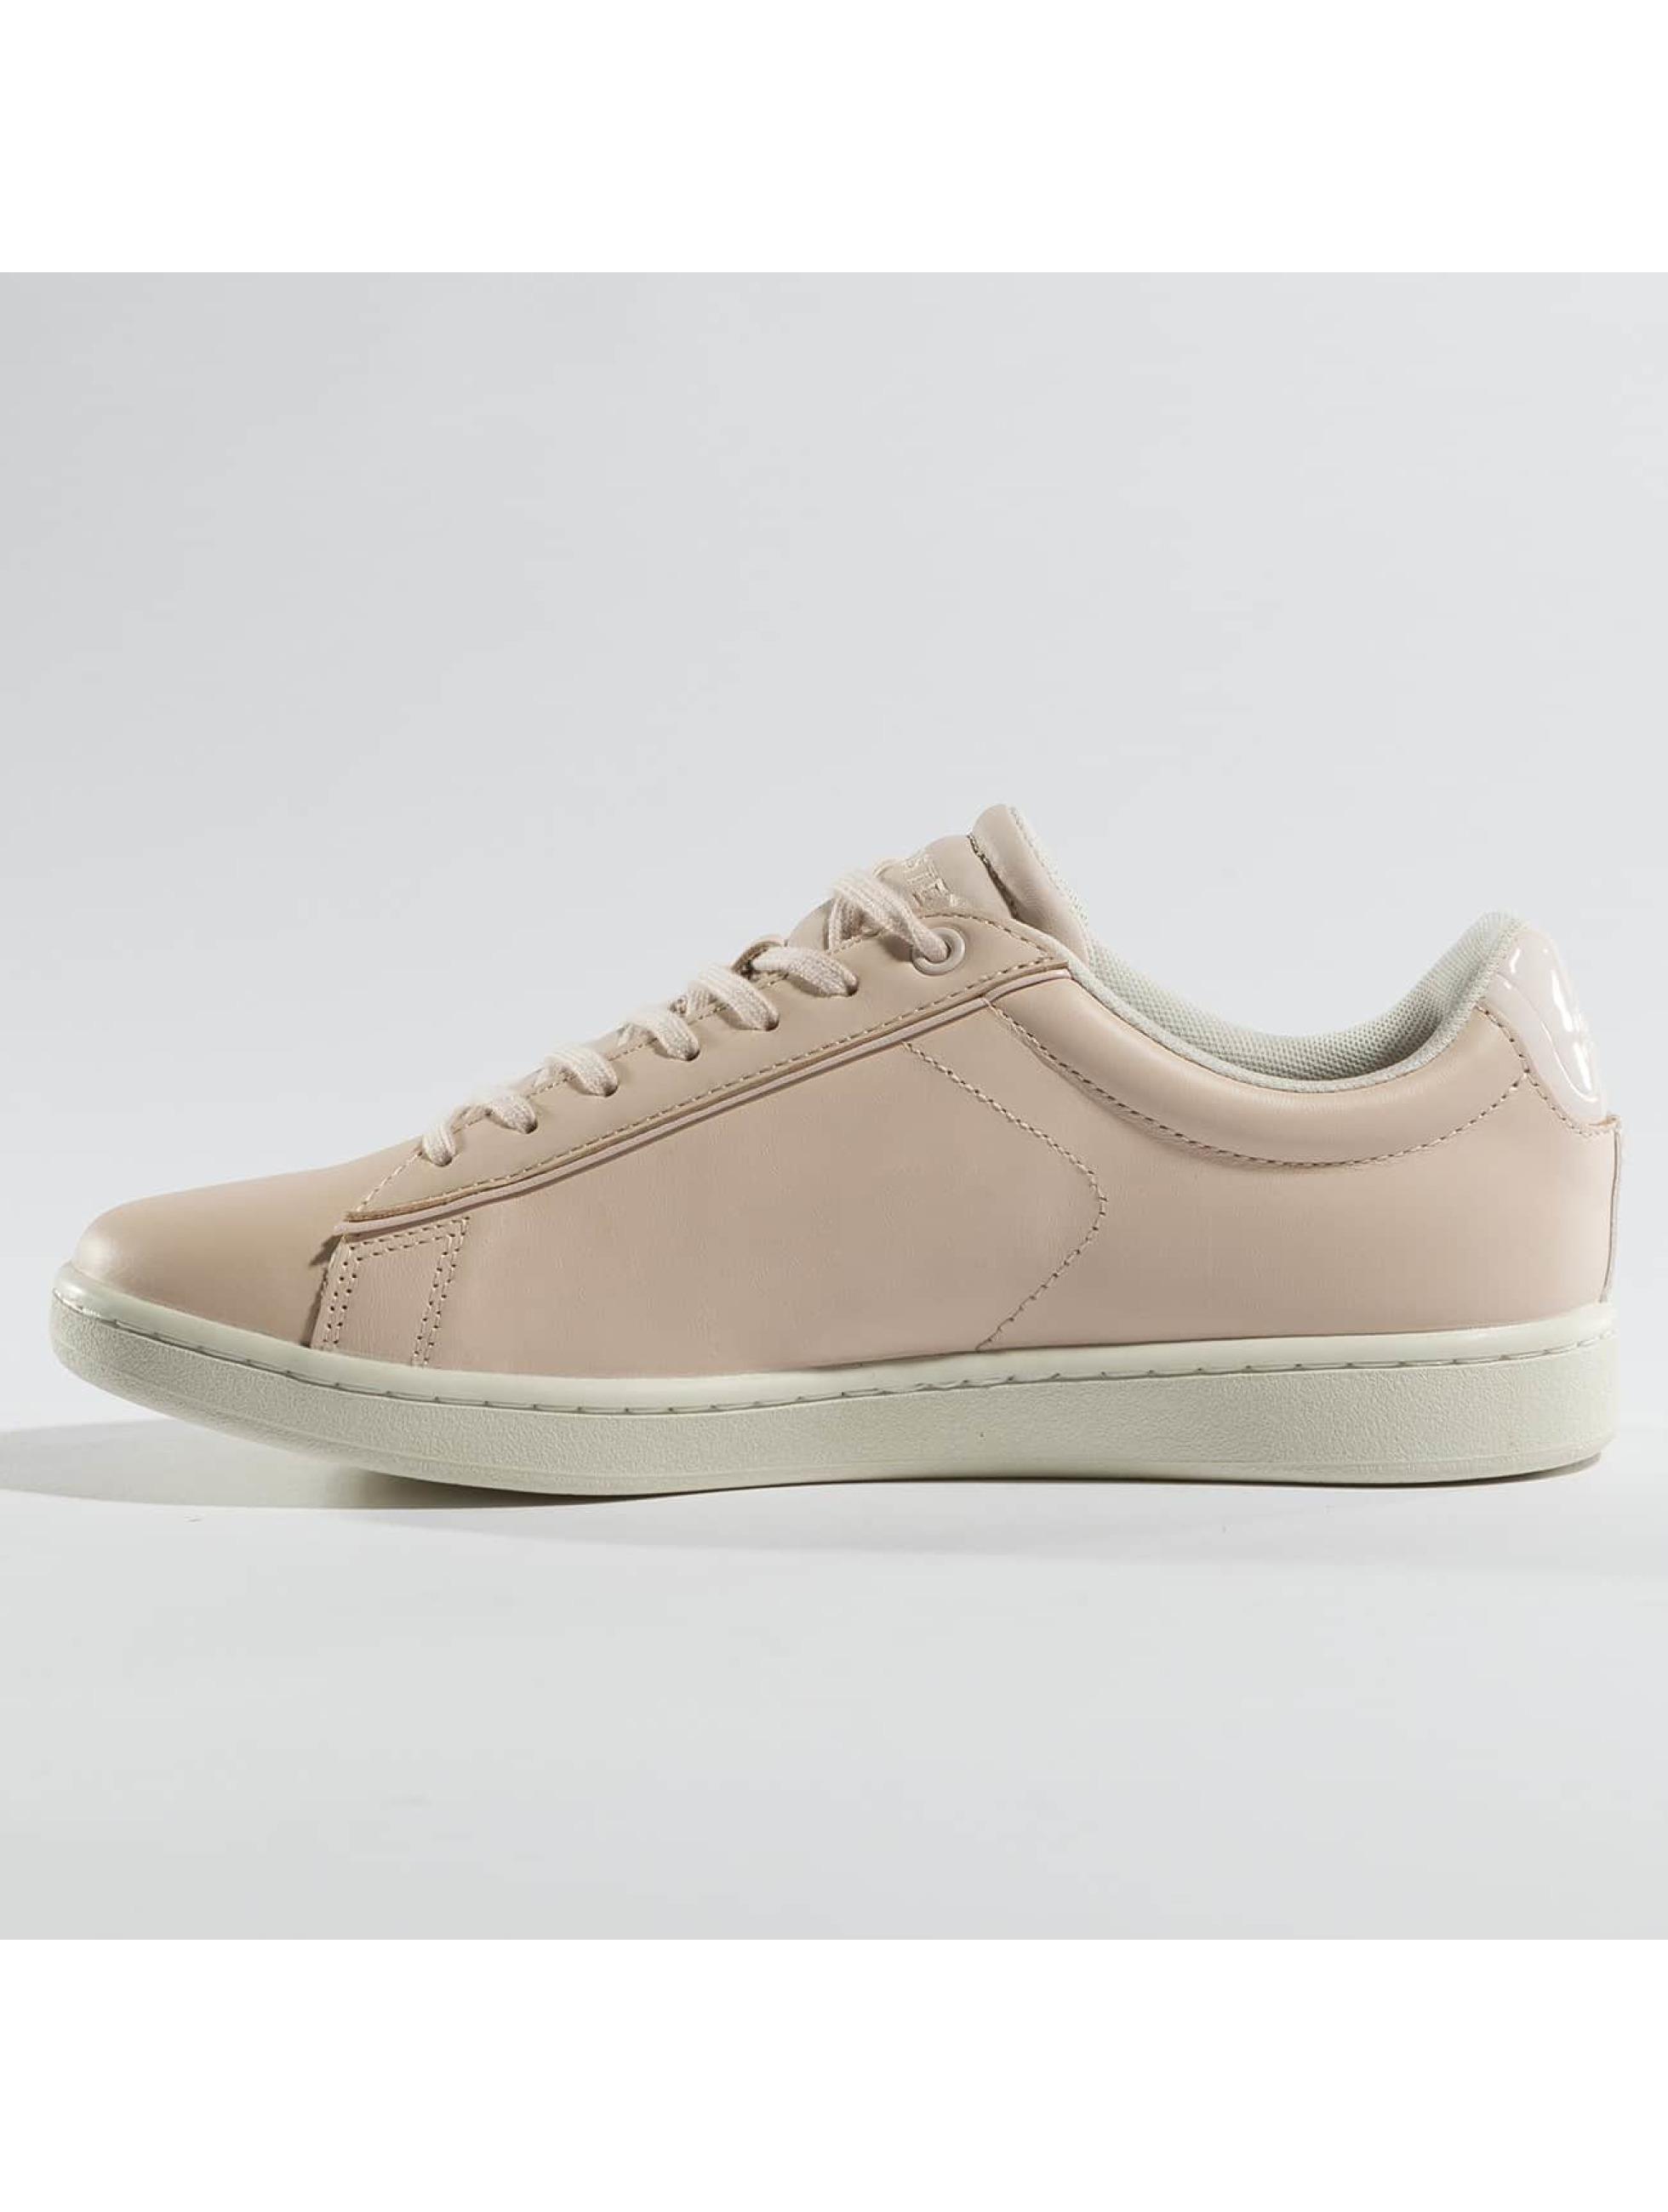 lacoste damen sneaker carnaby evo 417 1 spw in pink 371462. Black Bedroom Furniture Sets. Home Design Ideas